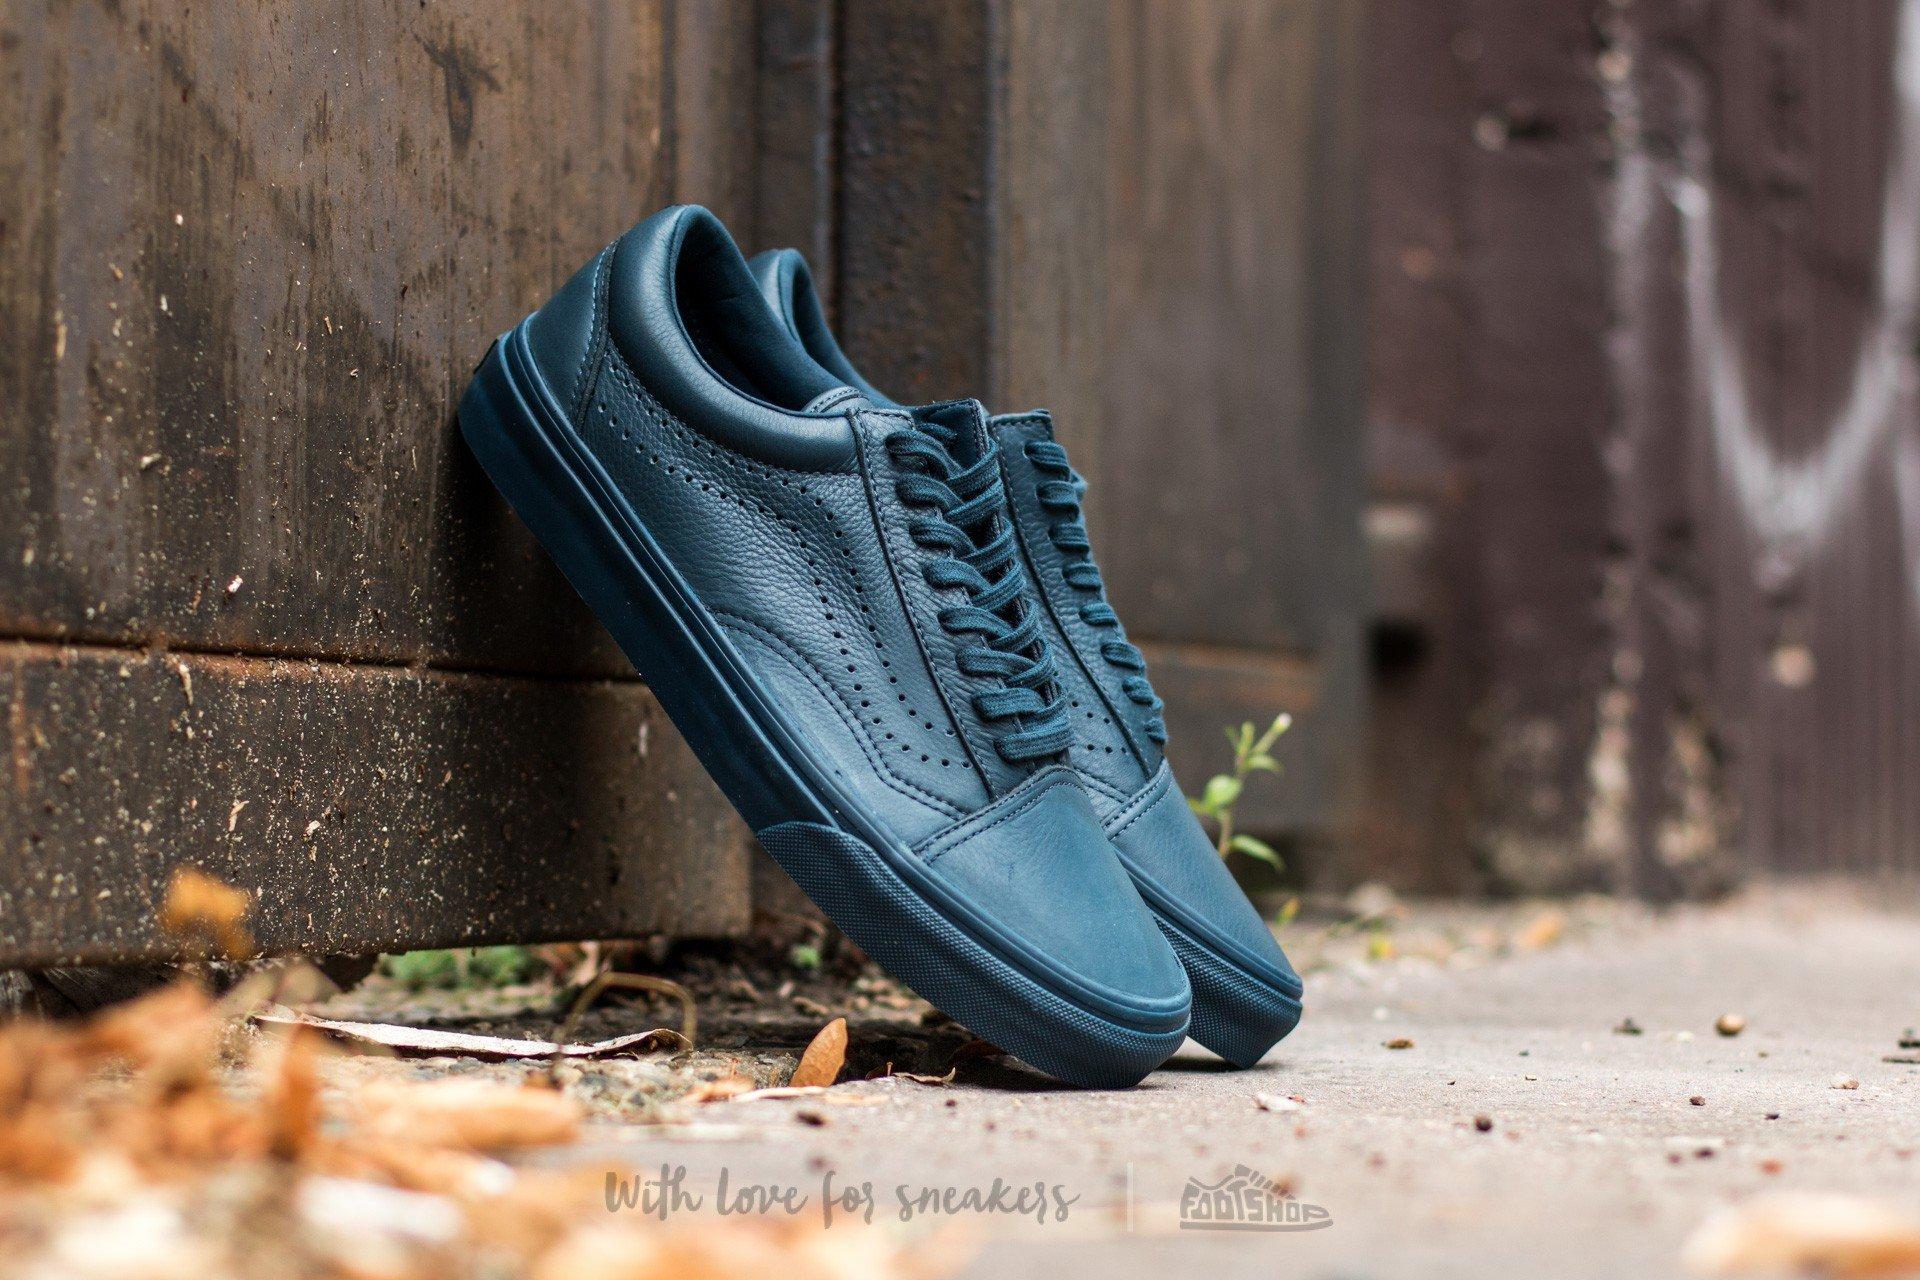 79f5d16978 Vans Old Skool Reissue (Leather) Midnight Navy